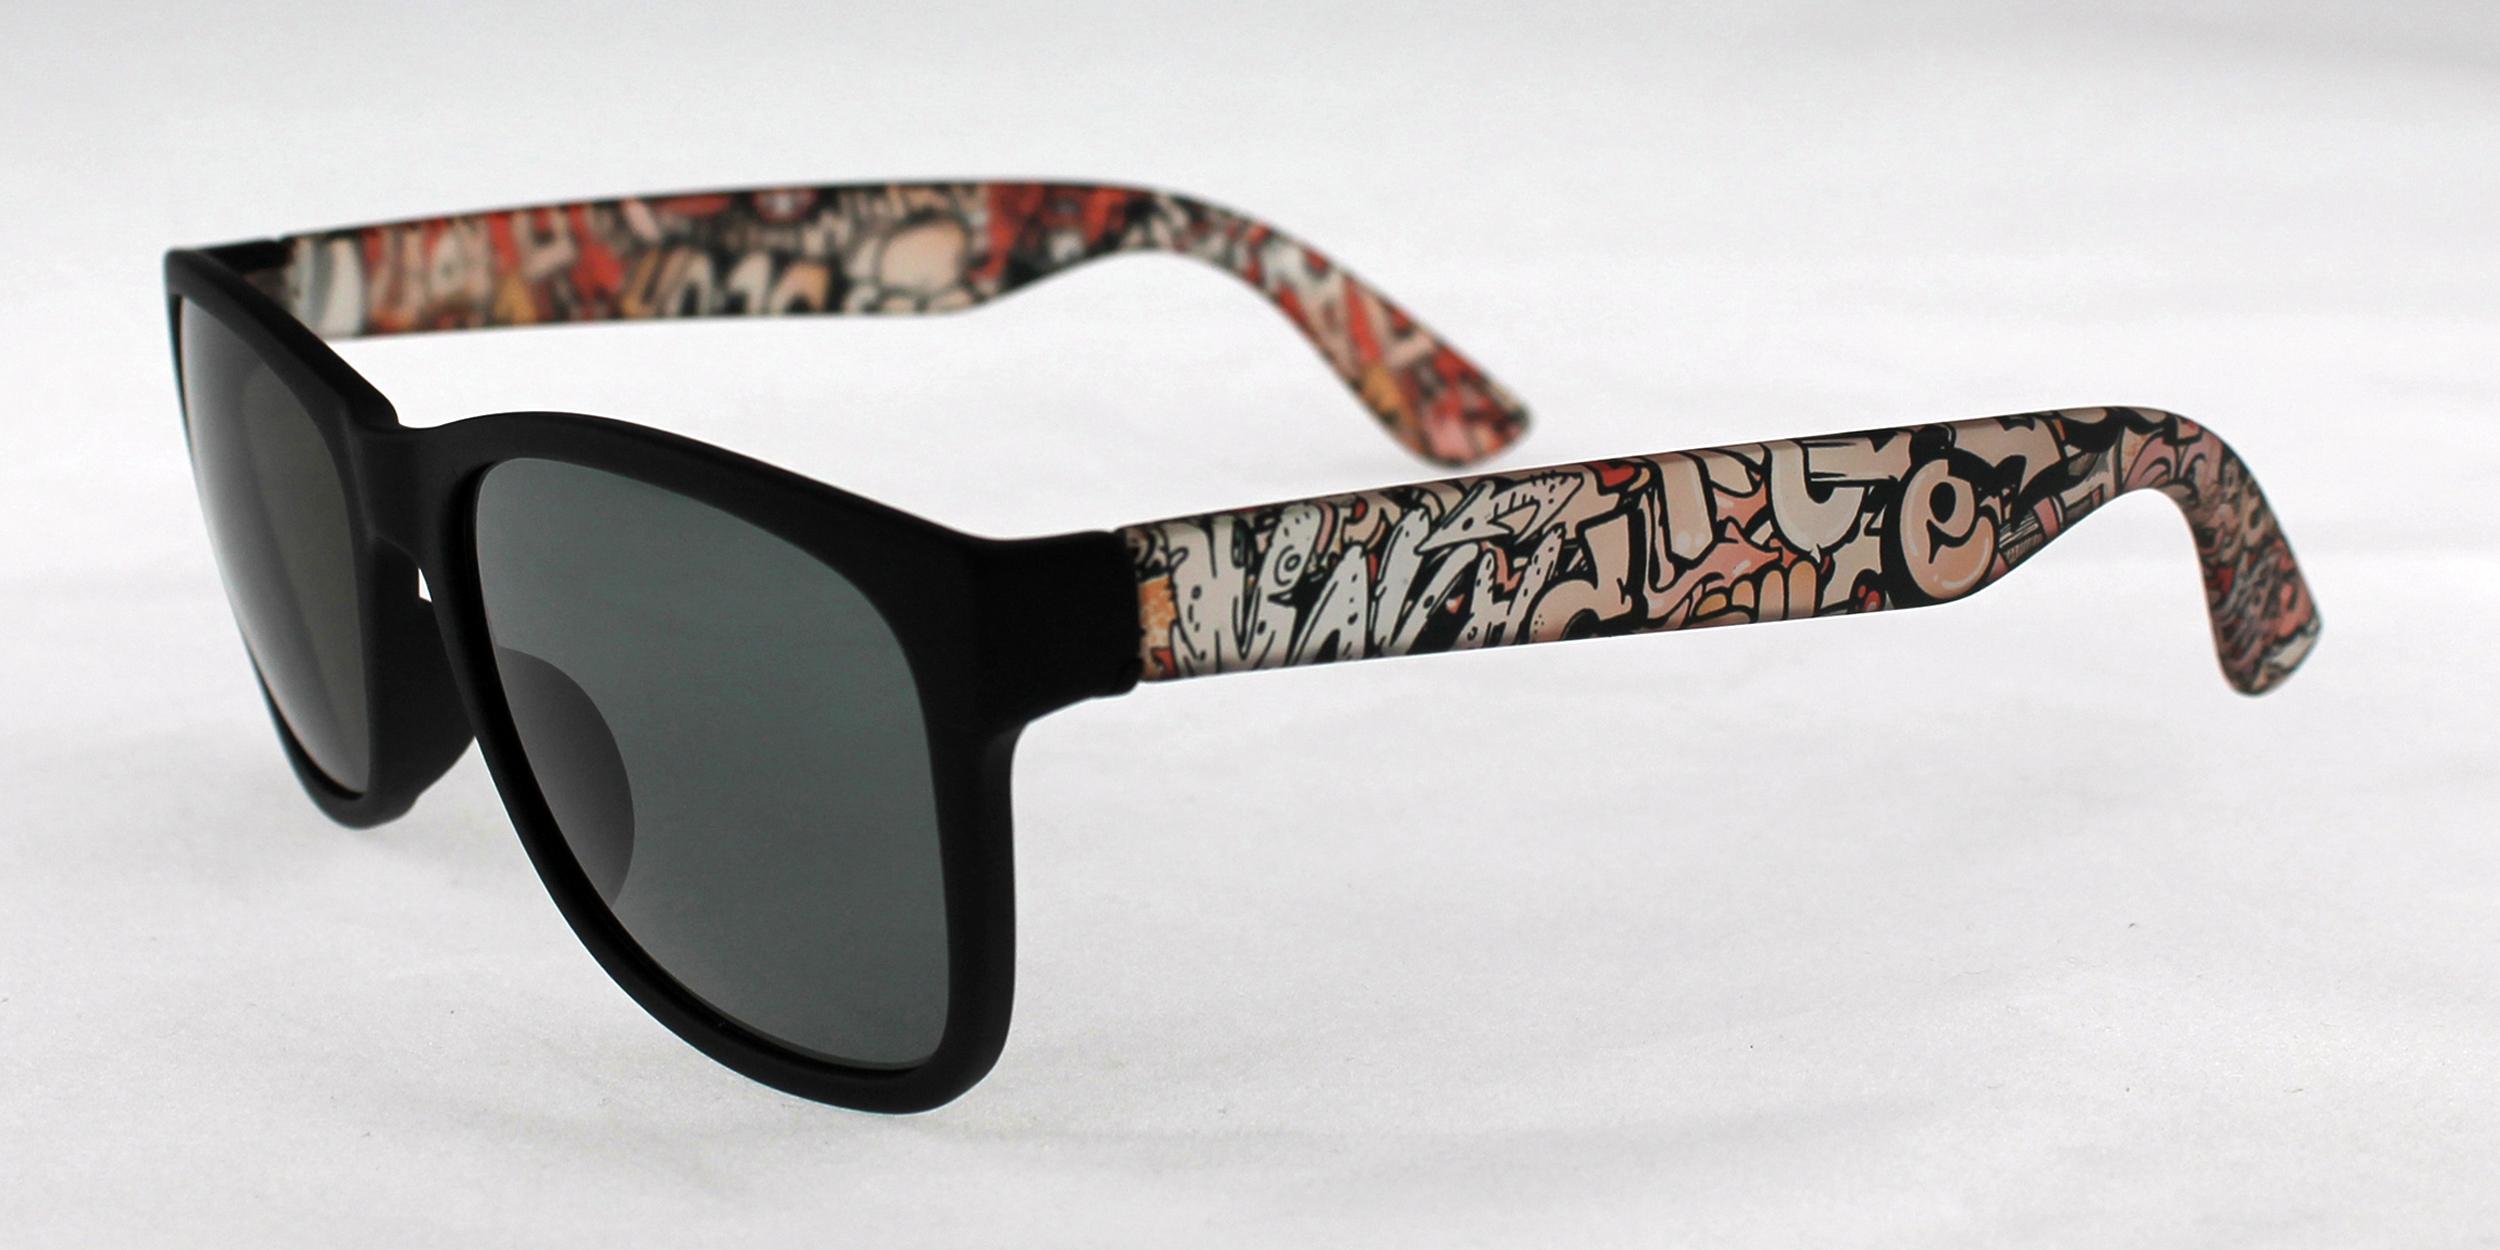 Canvas Eyewear - Custom Sunglasses | Indiegogo